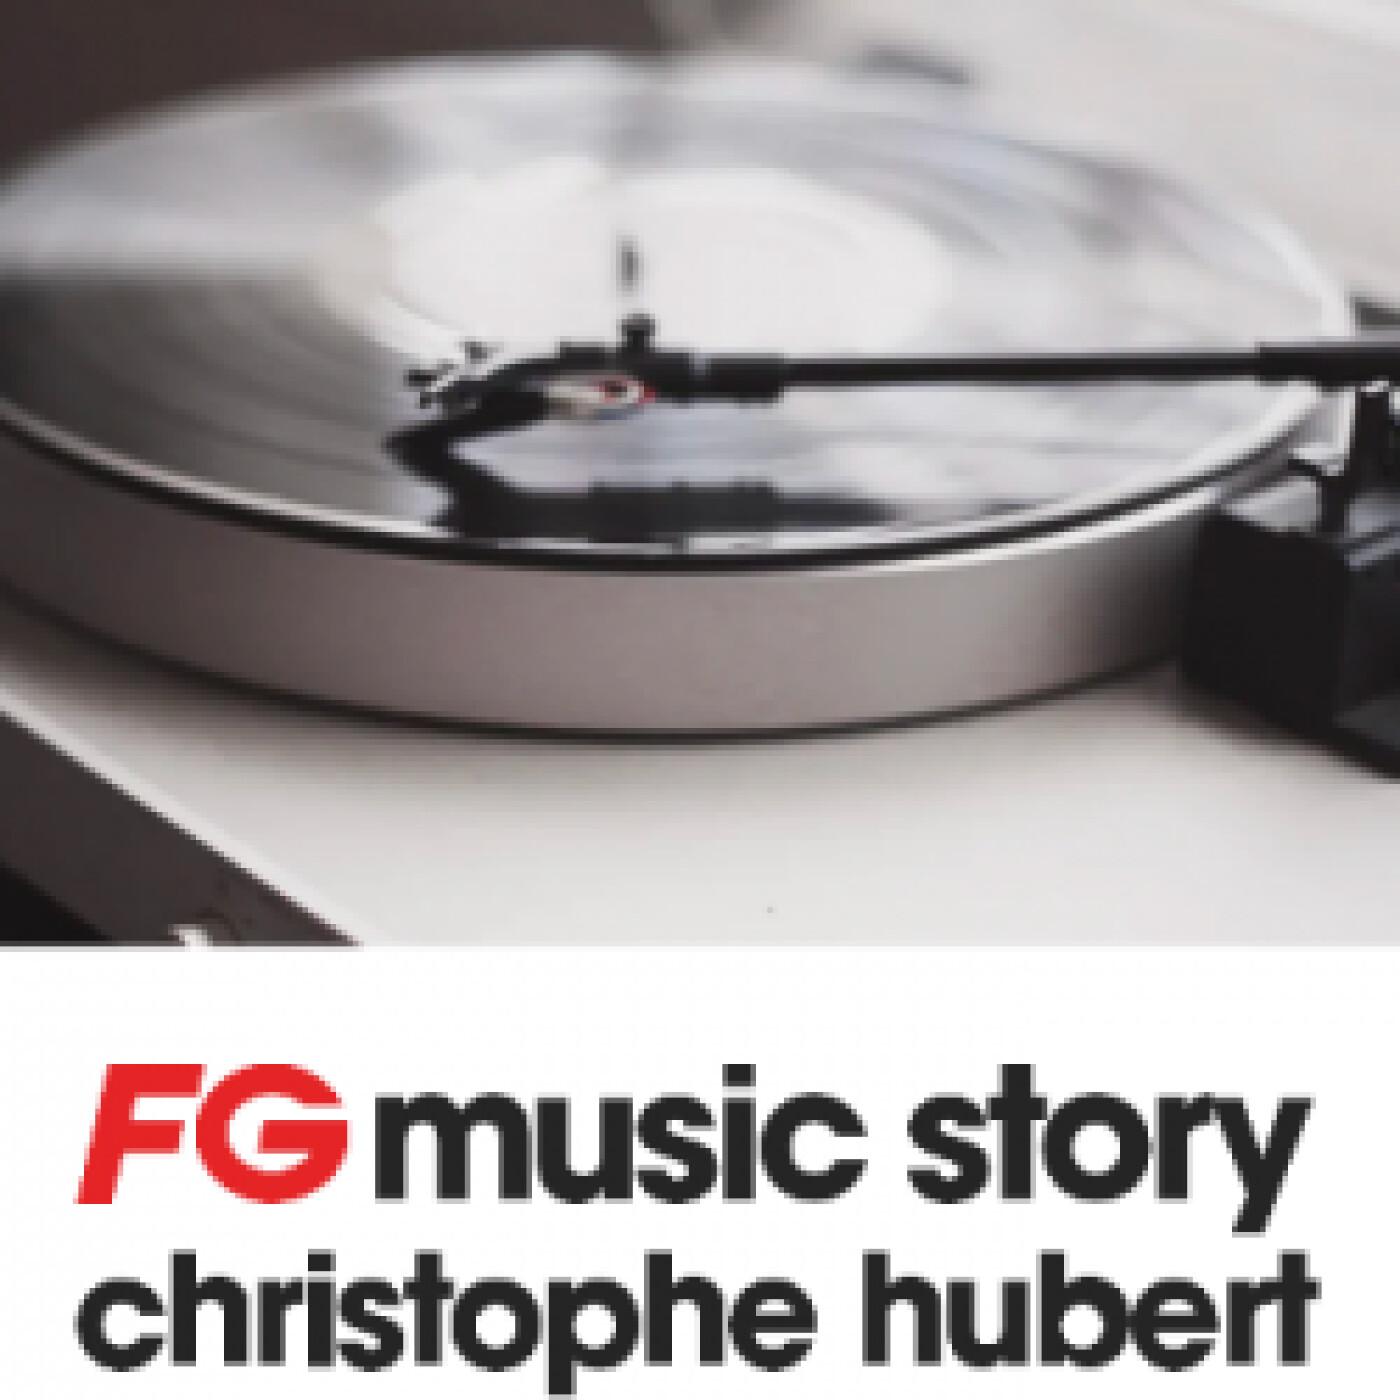 FG MUSIC STORY : WOODKID